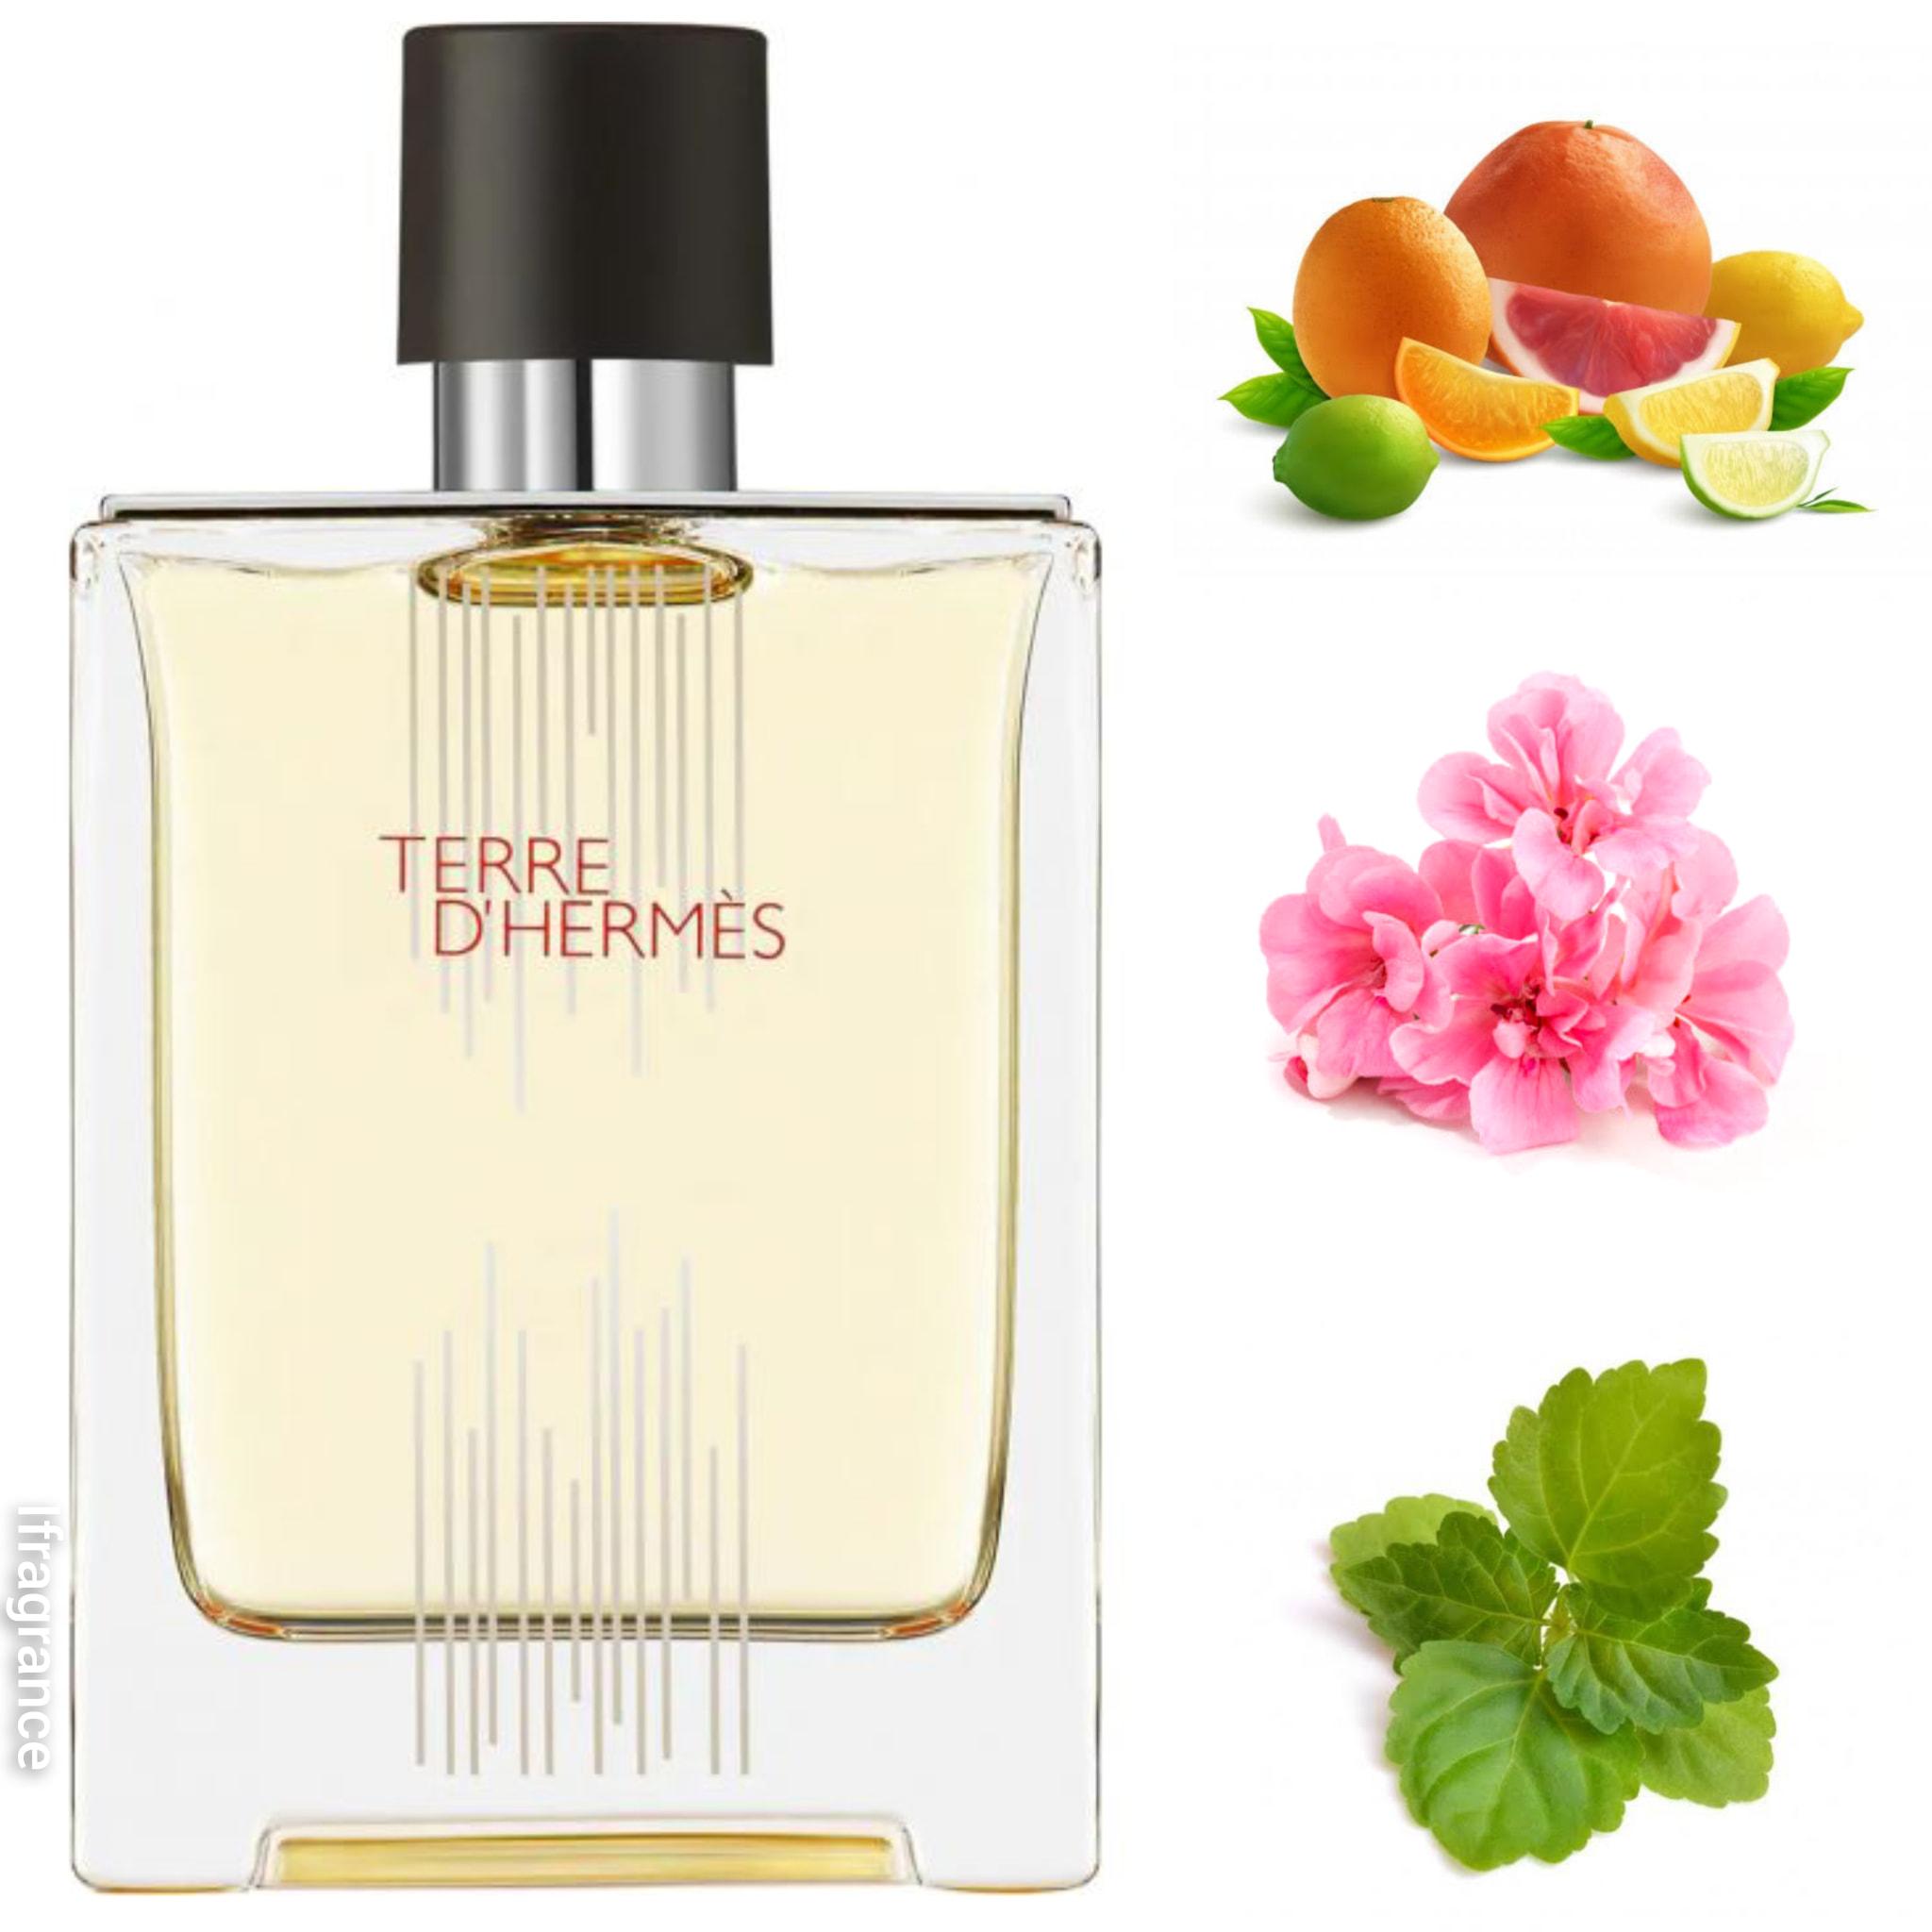 عطر تيري دي هيرميس الجديد لعام 2021 Terre d'Hermès Bottle H Eau de Toilette Limited Edition